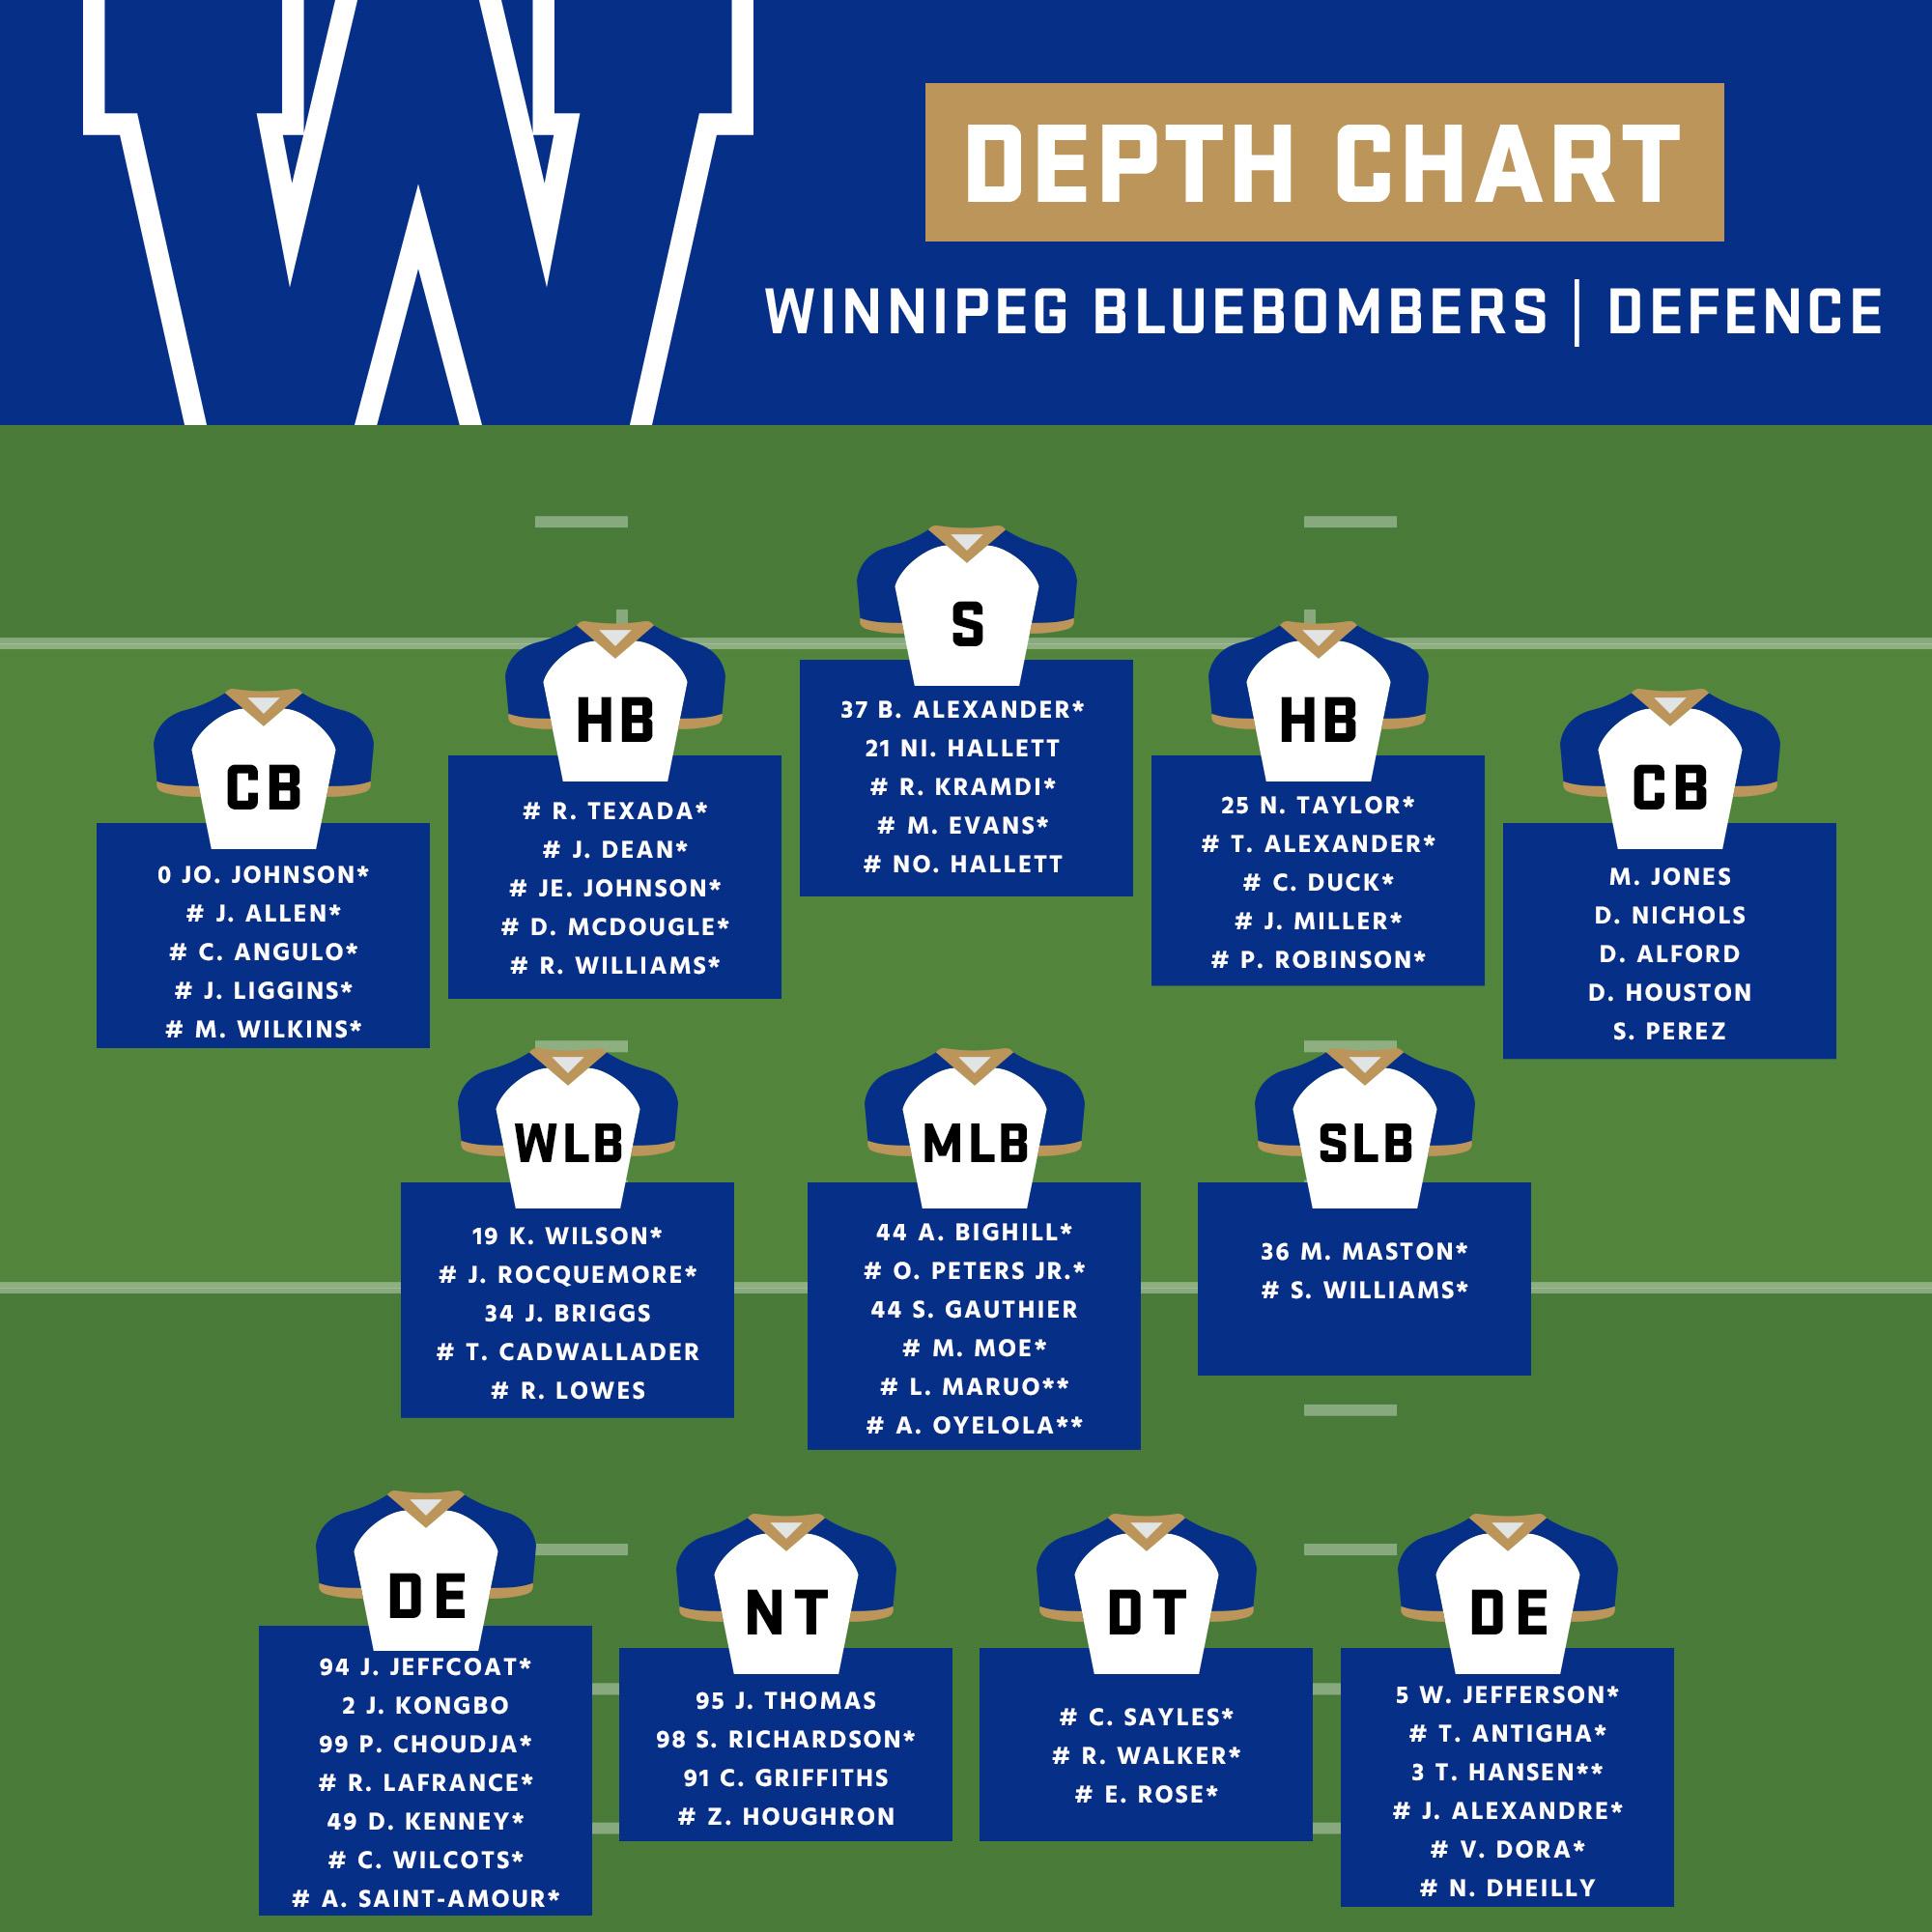 Winnipeg-Depth-Chart-Off-Season-2021-Defence.jpg